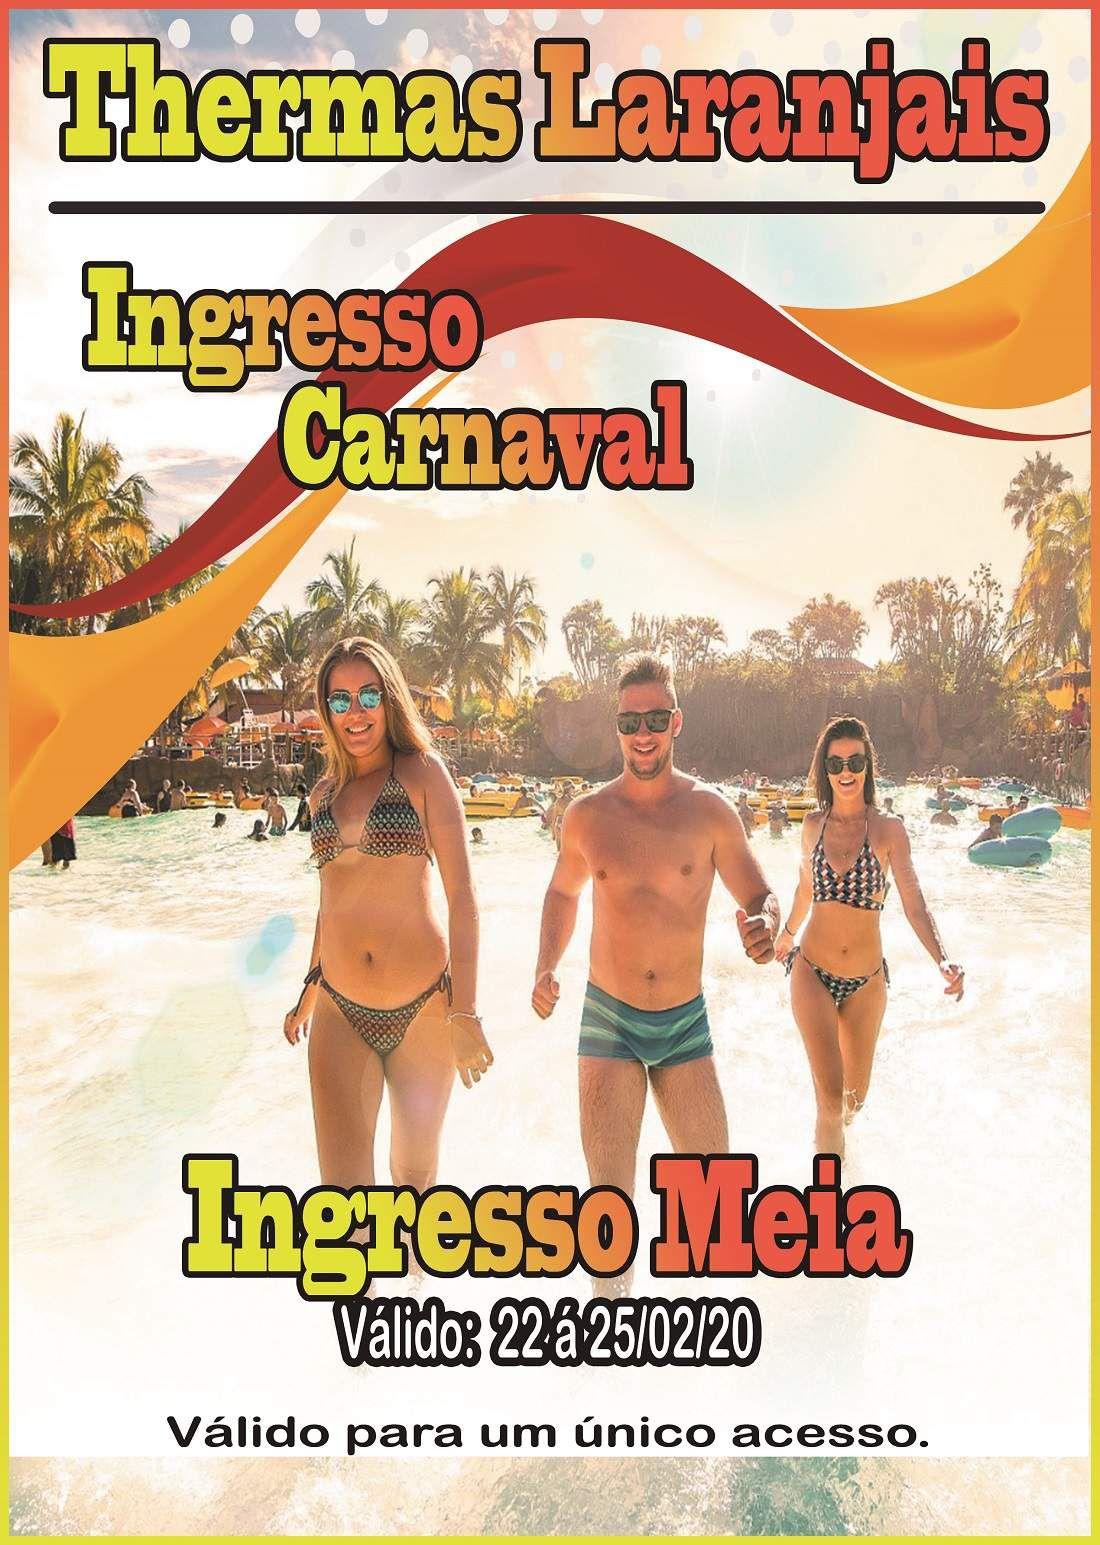 Ingresso Meia - Carnaval 2020  - Thermas Fácil